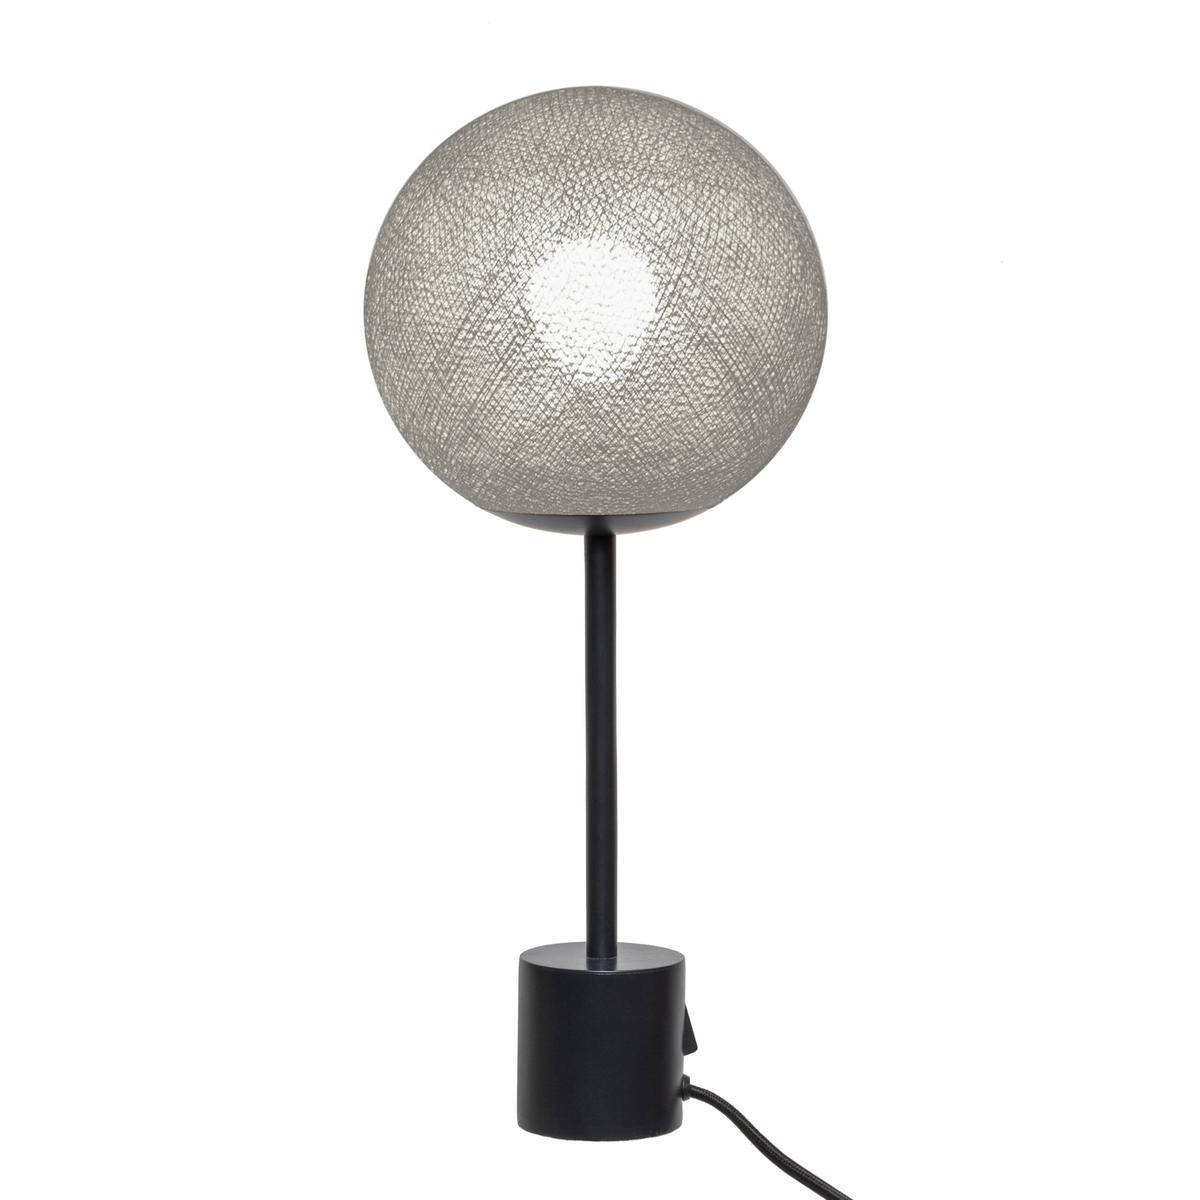 Lampe globe APAPA Grège